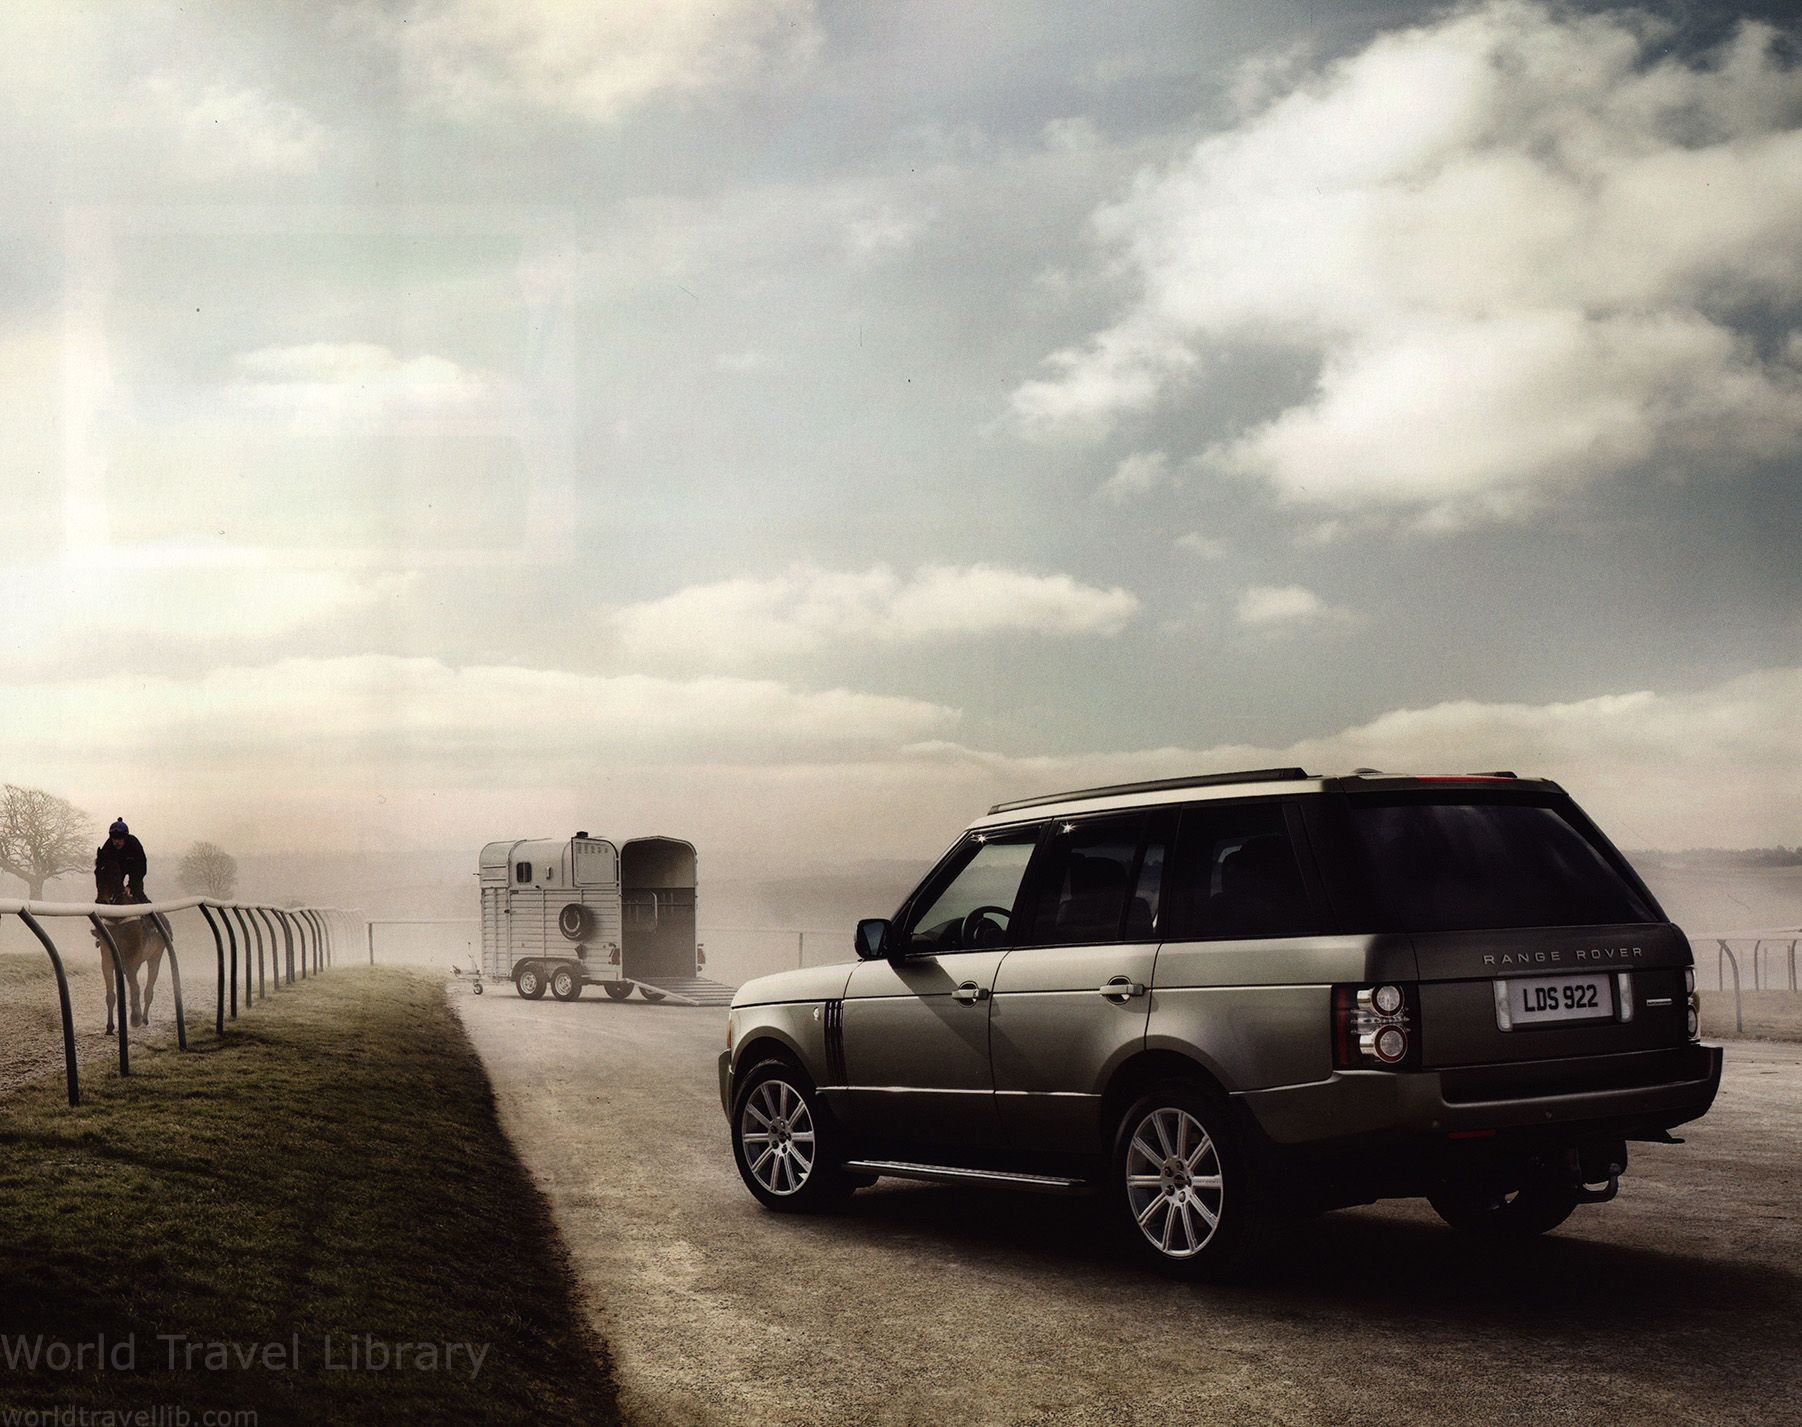 Land Rover Range Rover 2012 4 Car Brochures In 2020 Land Rover Range Rover Car Brochure